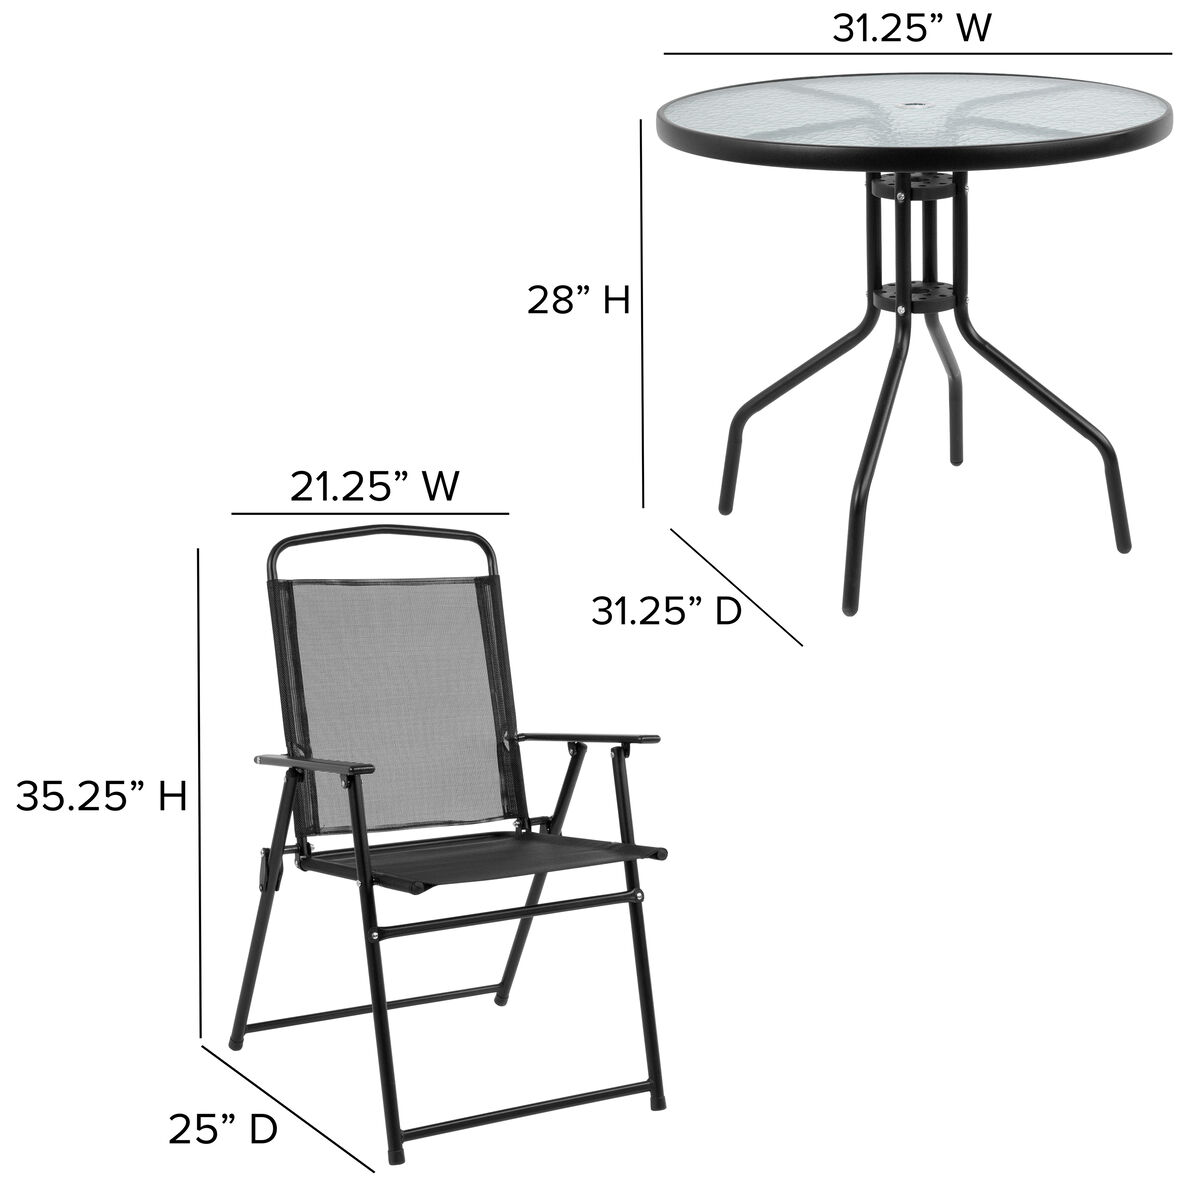 Strange Nantucket 6 Piece Black Patio Garden Set With Table Umbrella And 4 Folding Chairs Machost Co Dining Chair Design Ideas Machostcouk